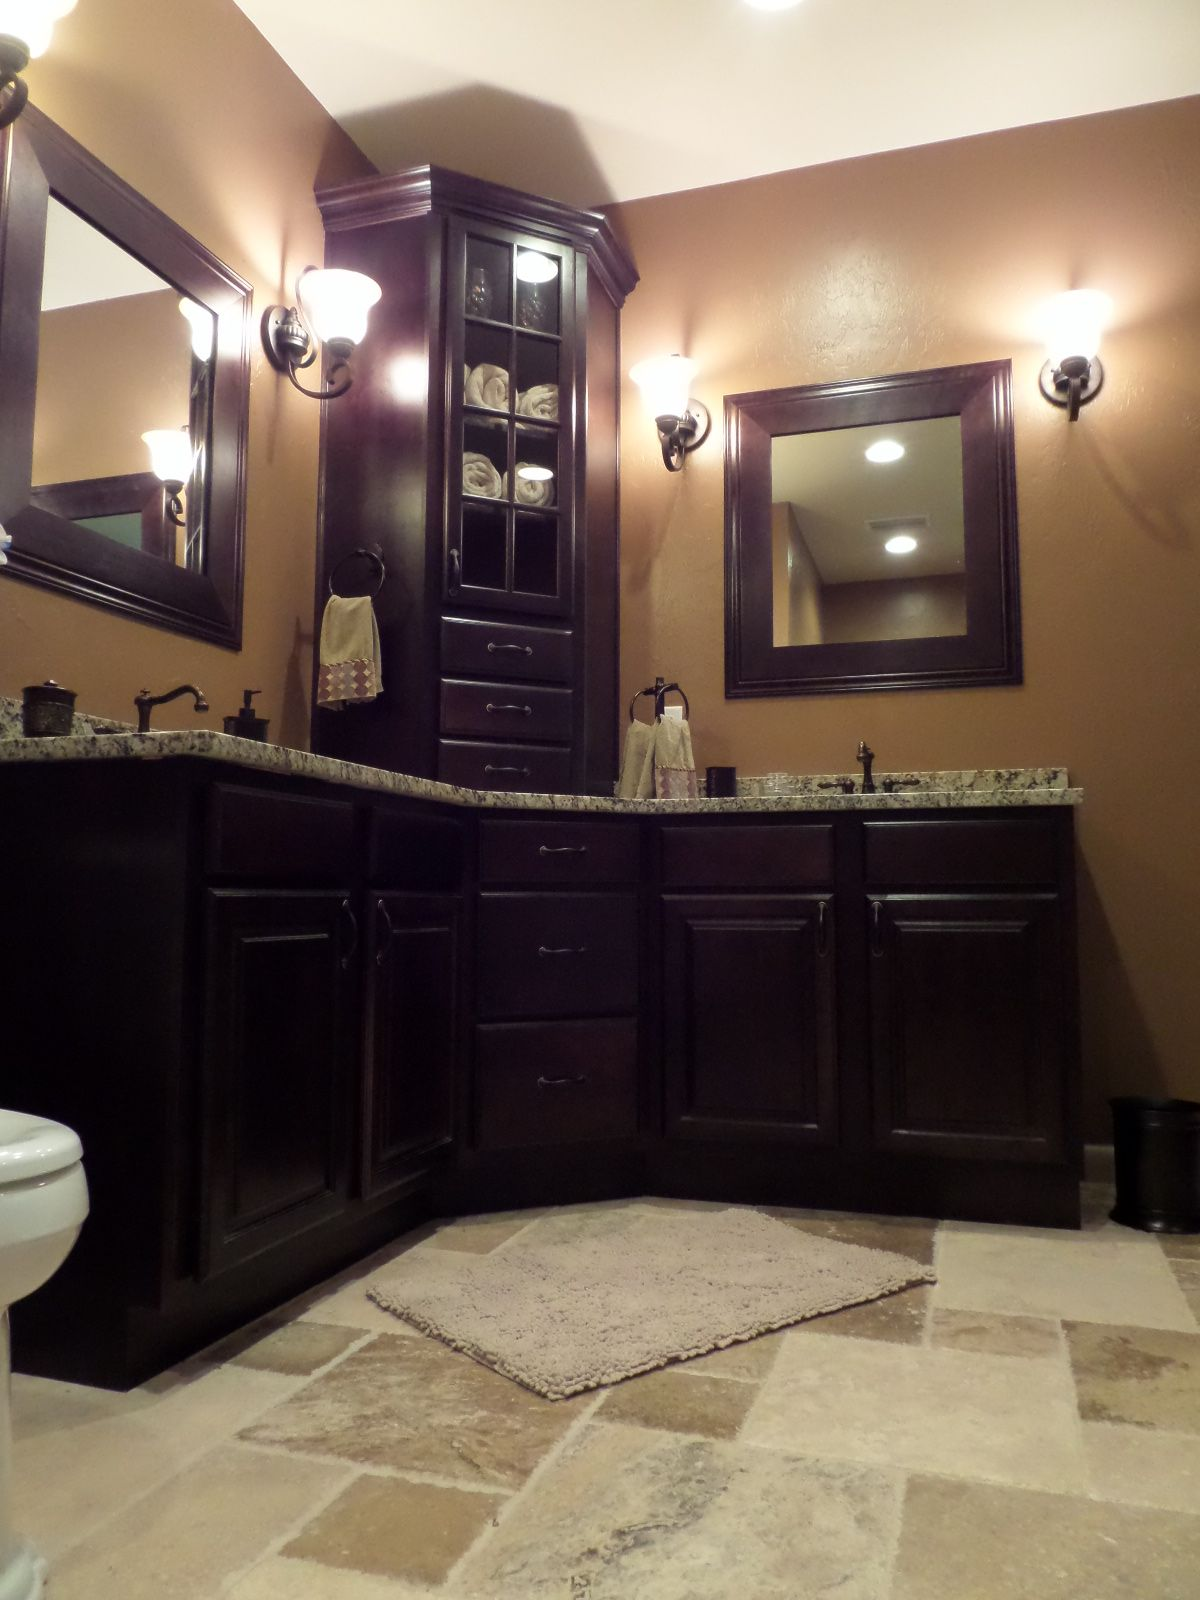 bathroom corner vanity cabinets. Custom Corner Vanity, Love The Vanity And Tile. Would Like Larger Mirrors. Hall BathroomBathroom CabinetsBathroom Bathroom Cabinets